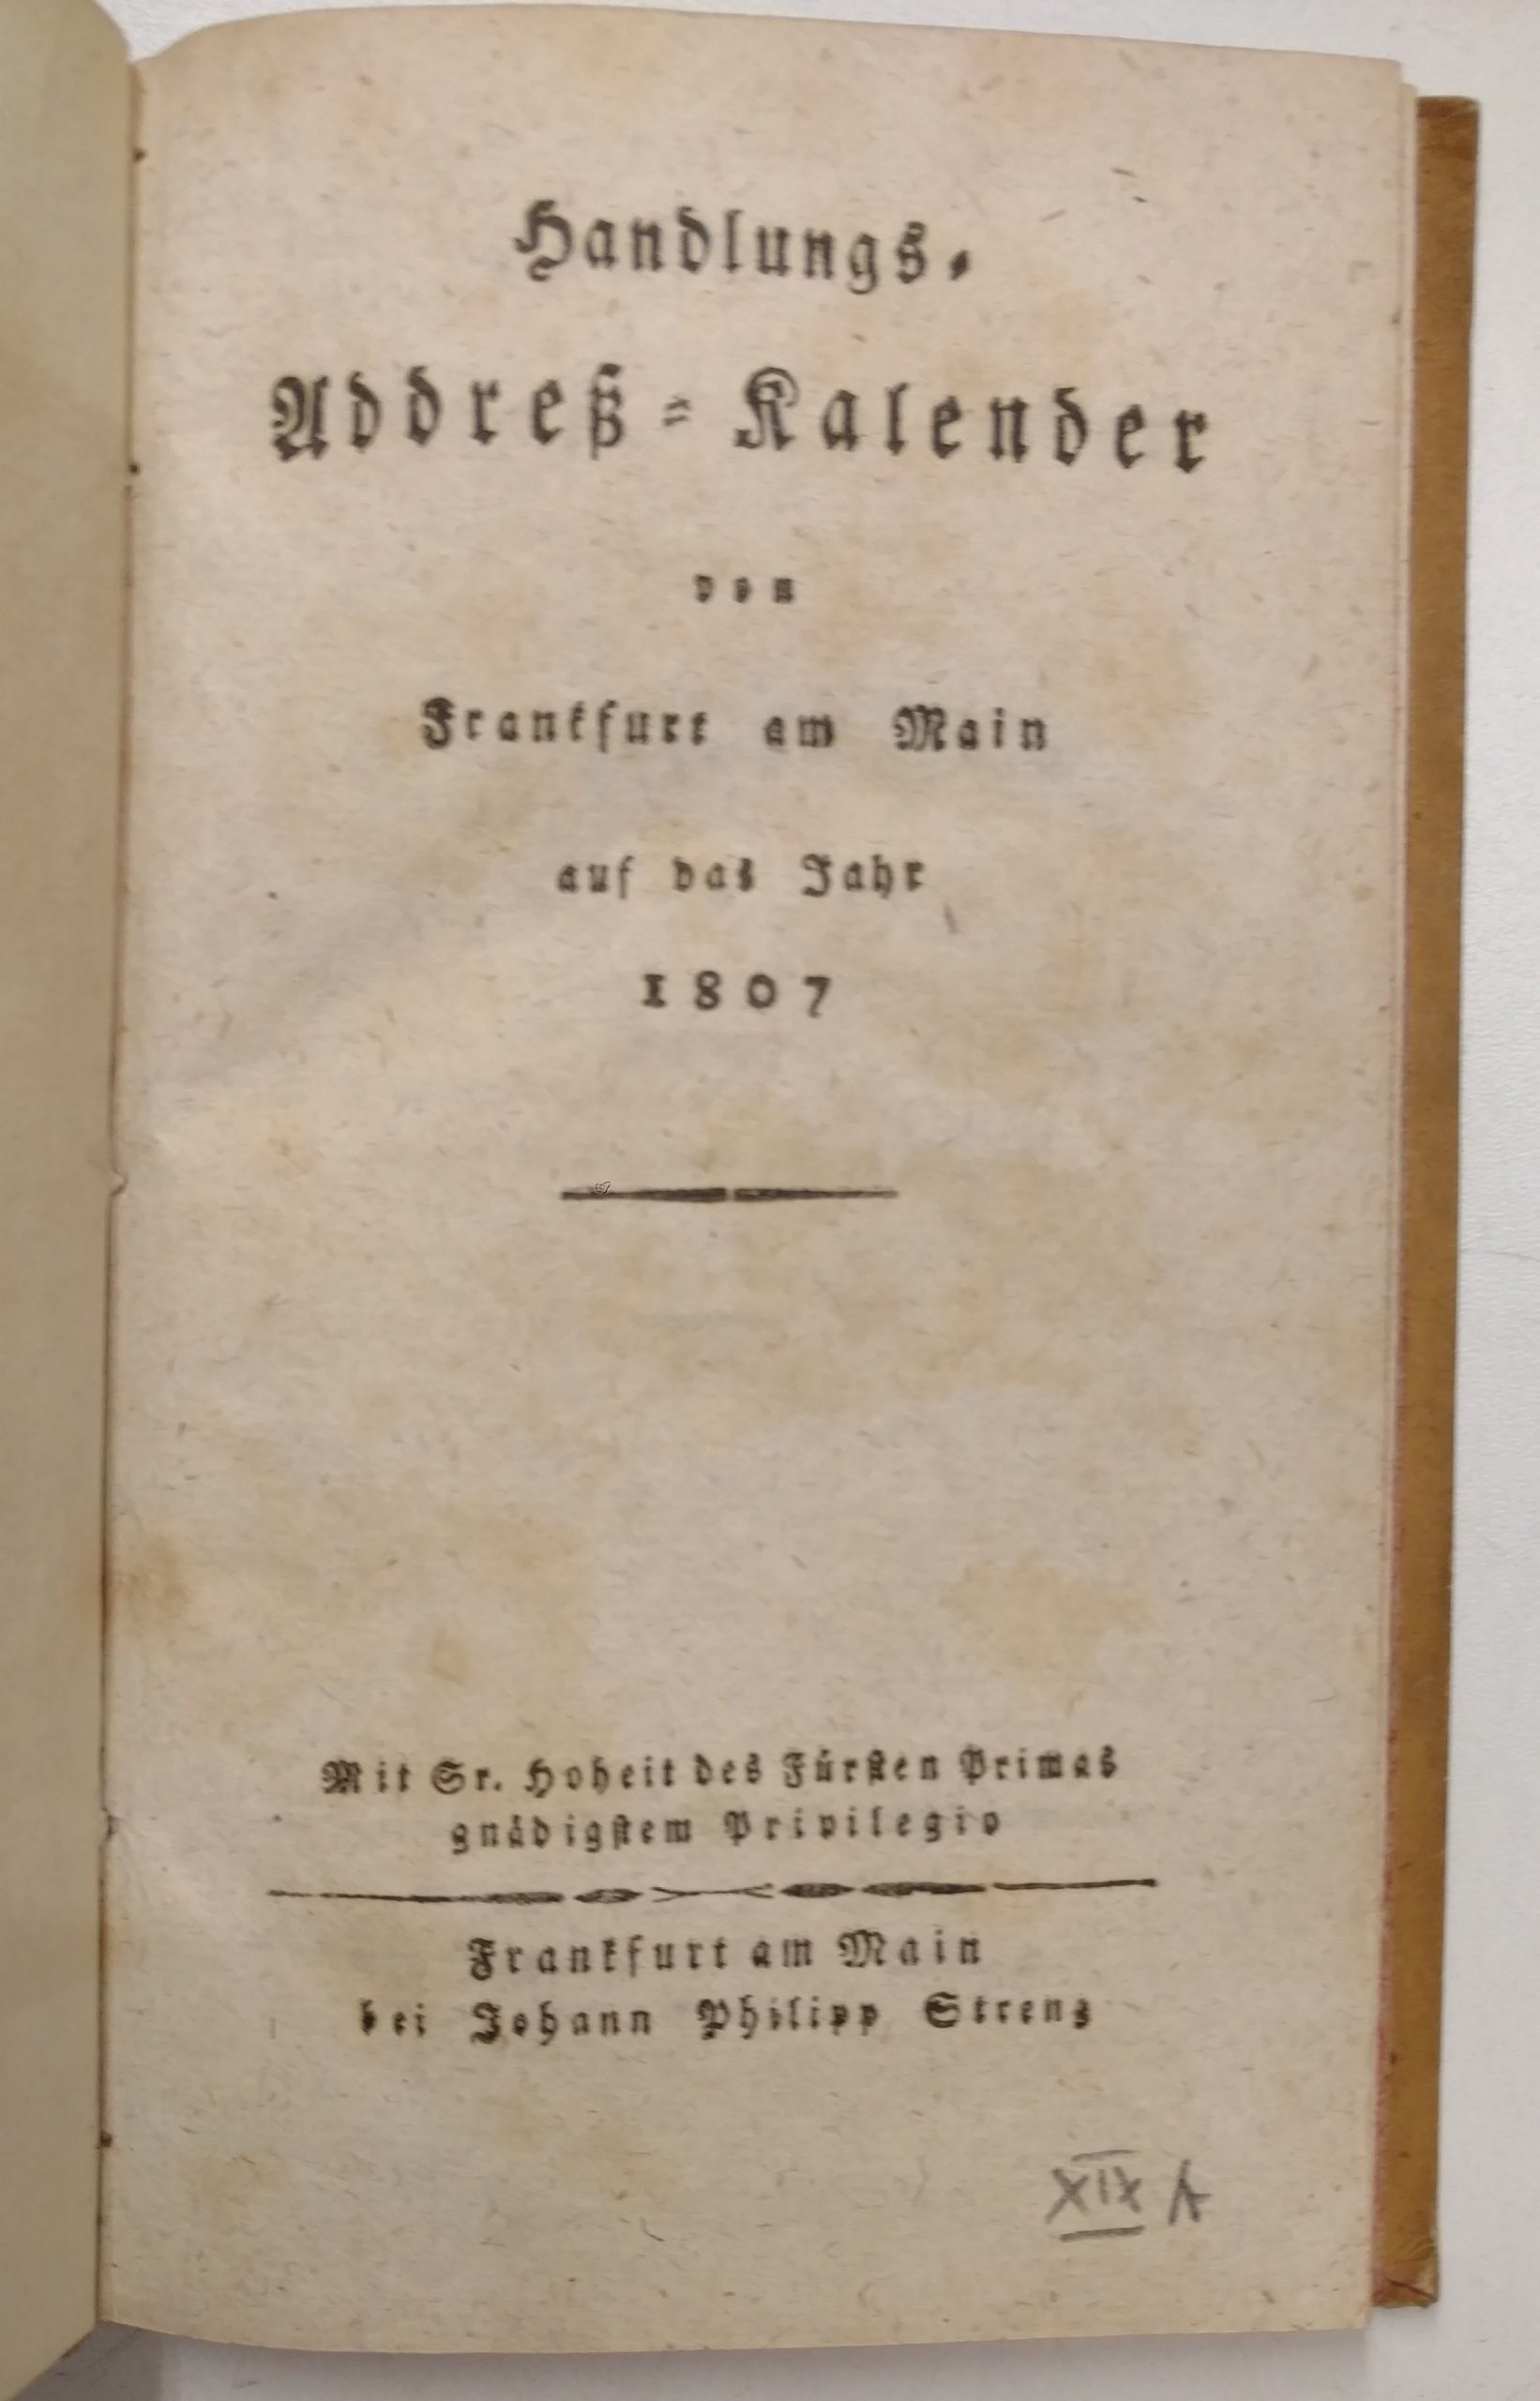 Handels-Addreßkalender Heilbrunn